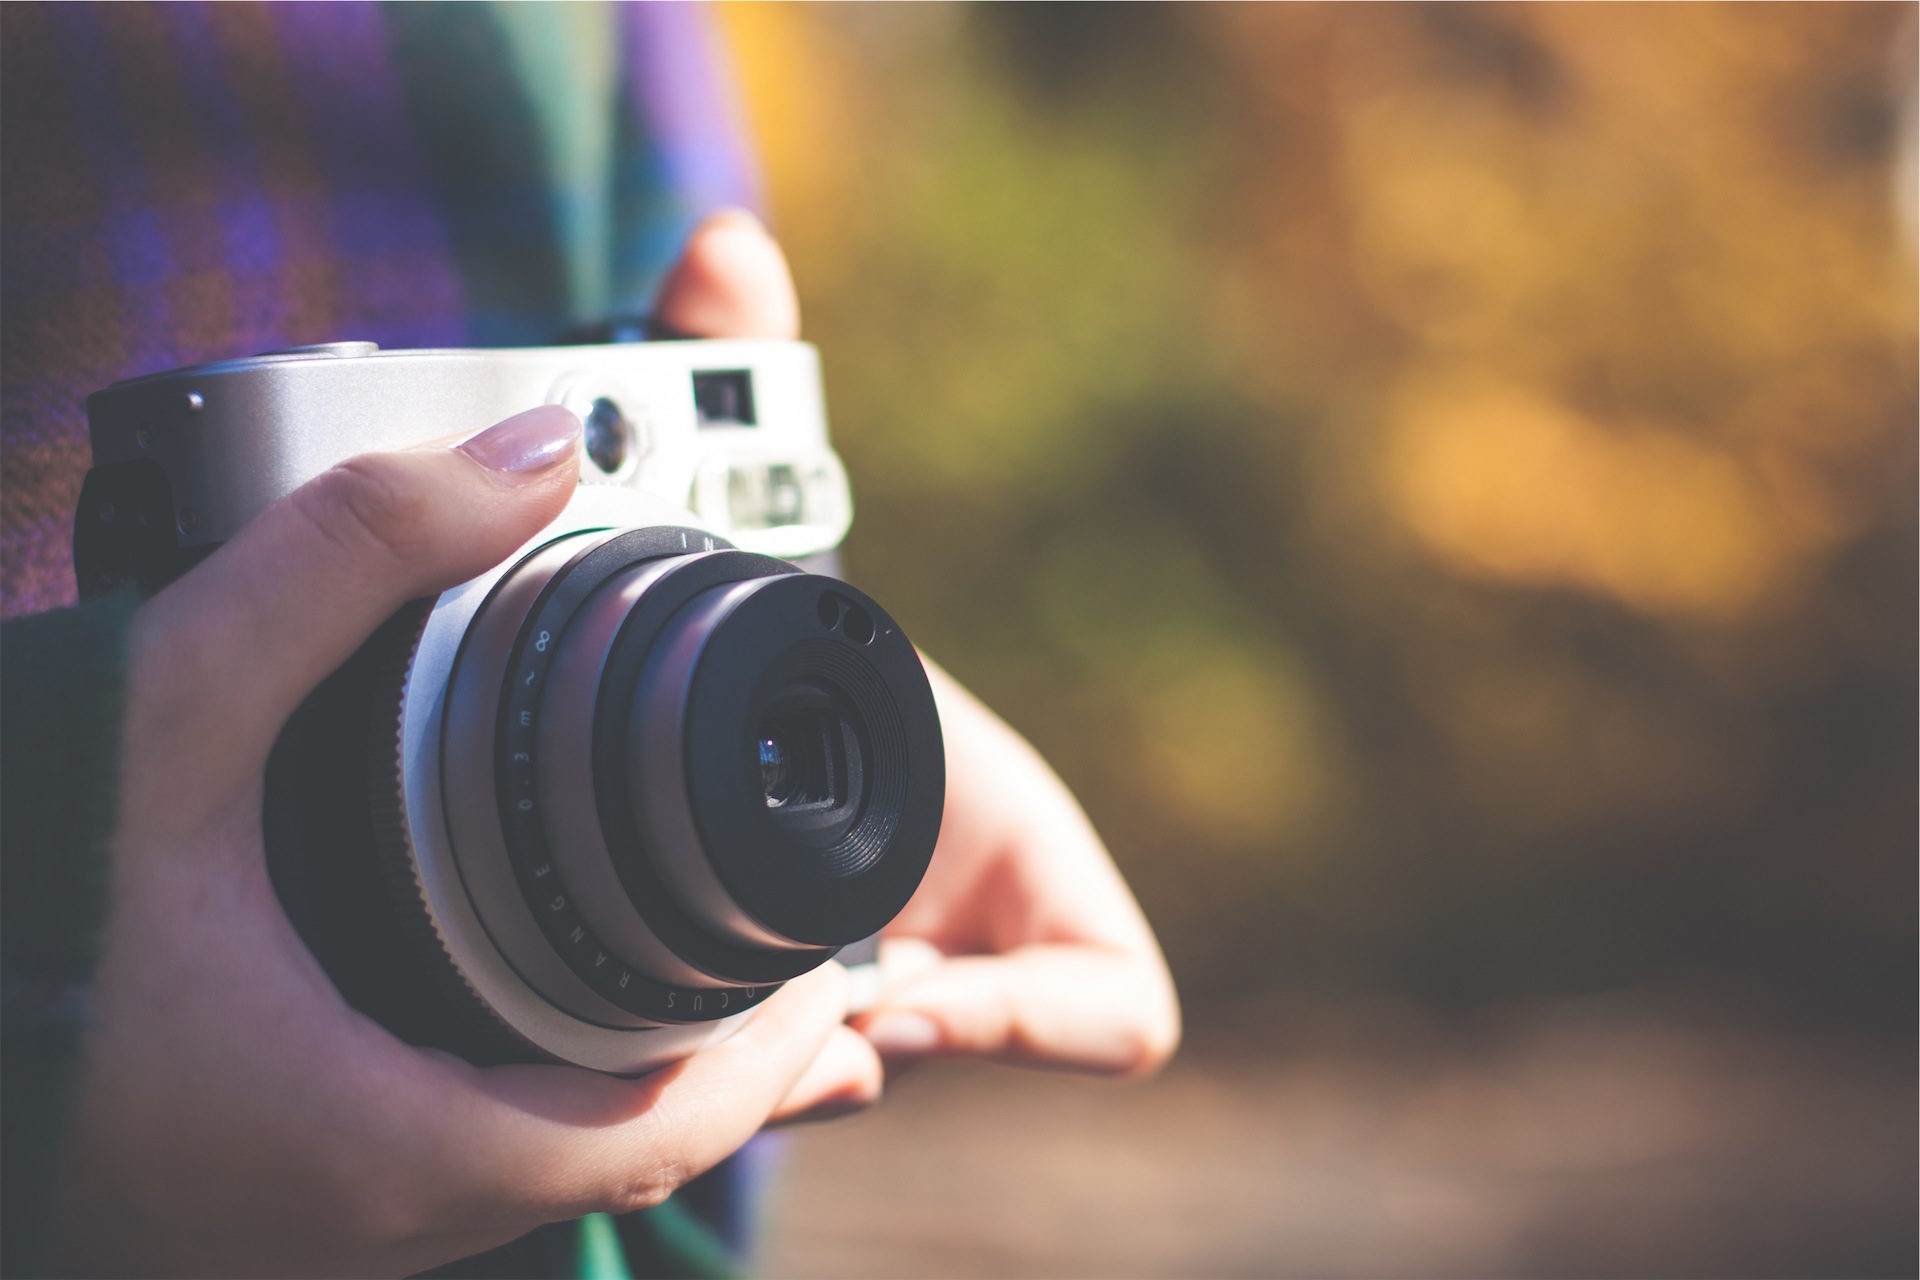 cámara, foto, mujer, manos, objetivo - Fondos de Pantalla HD - professor-falken.com